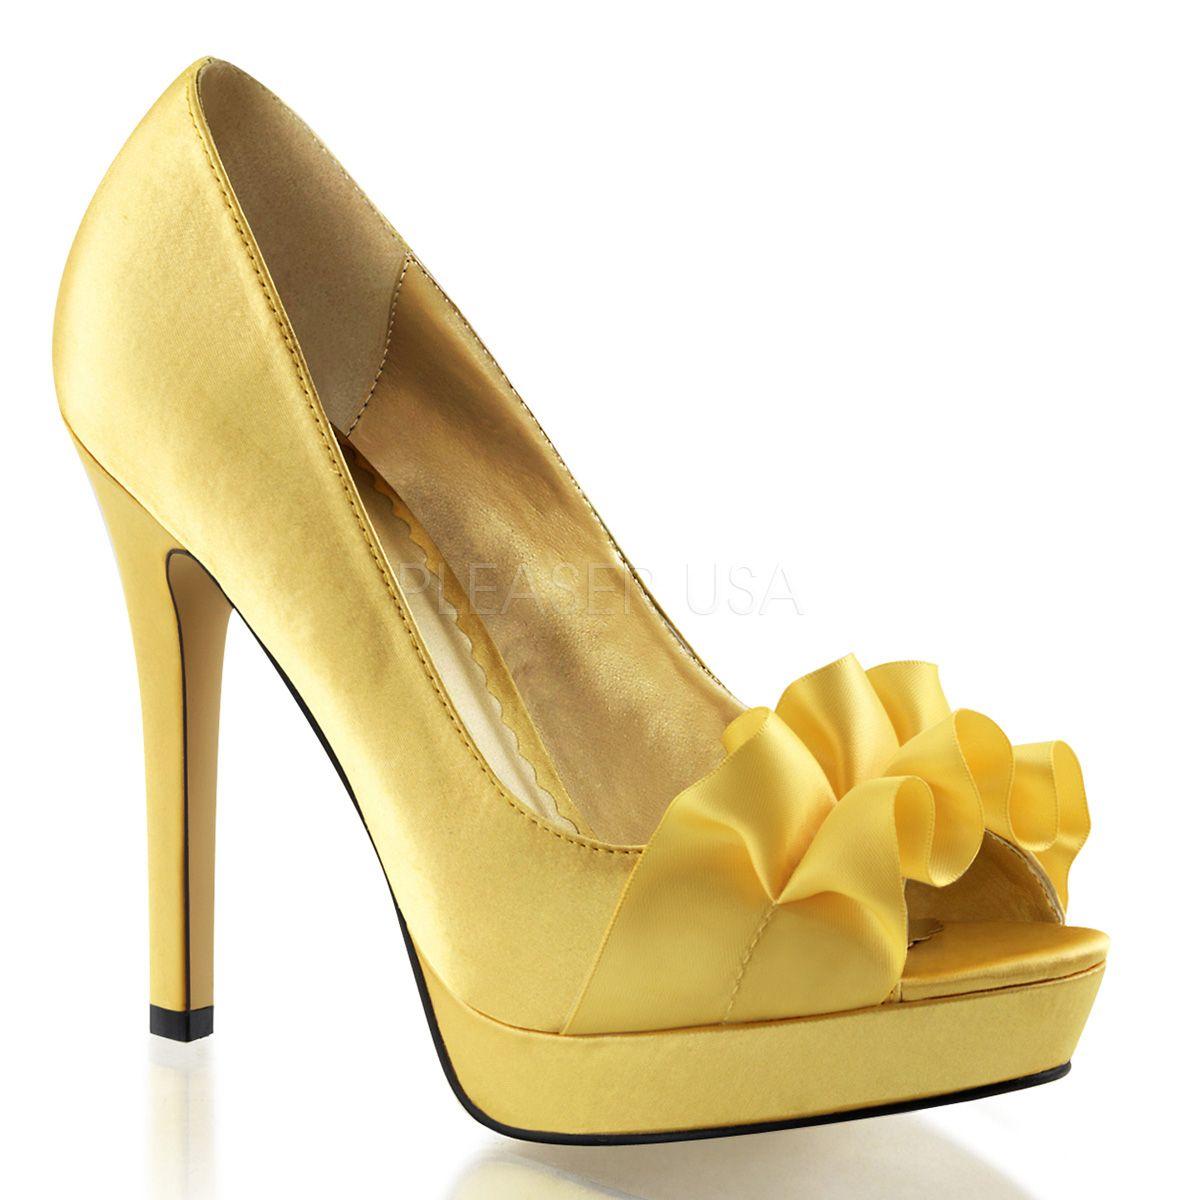 SALE! Fabulicious High Heel Pumps Lumina-42 gelb